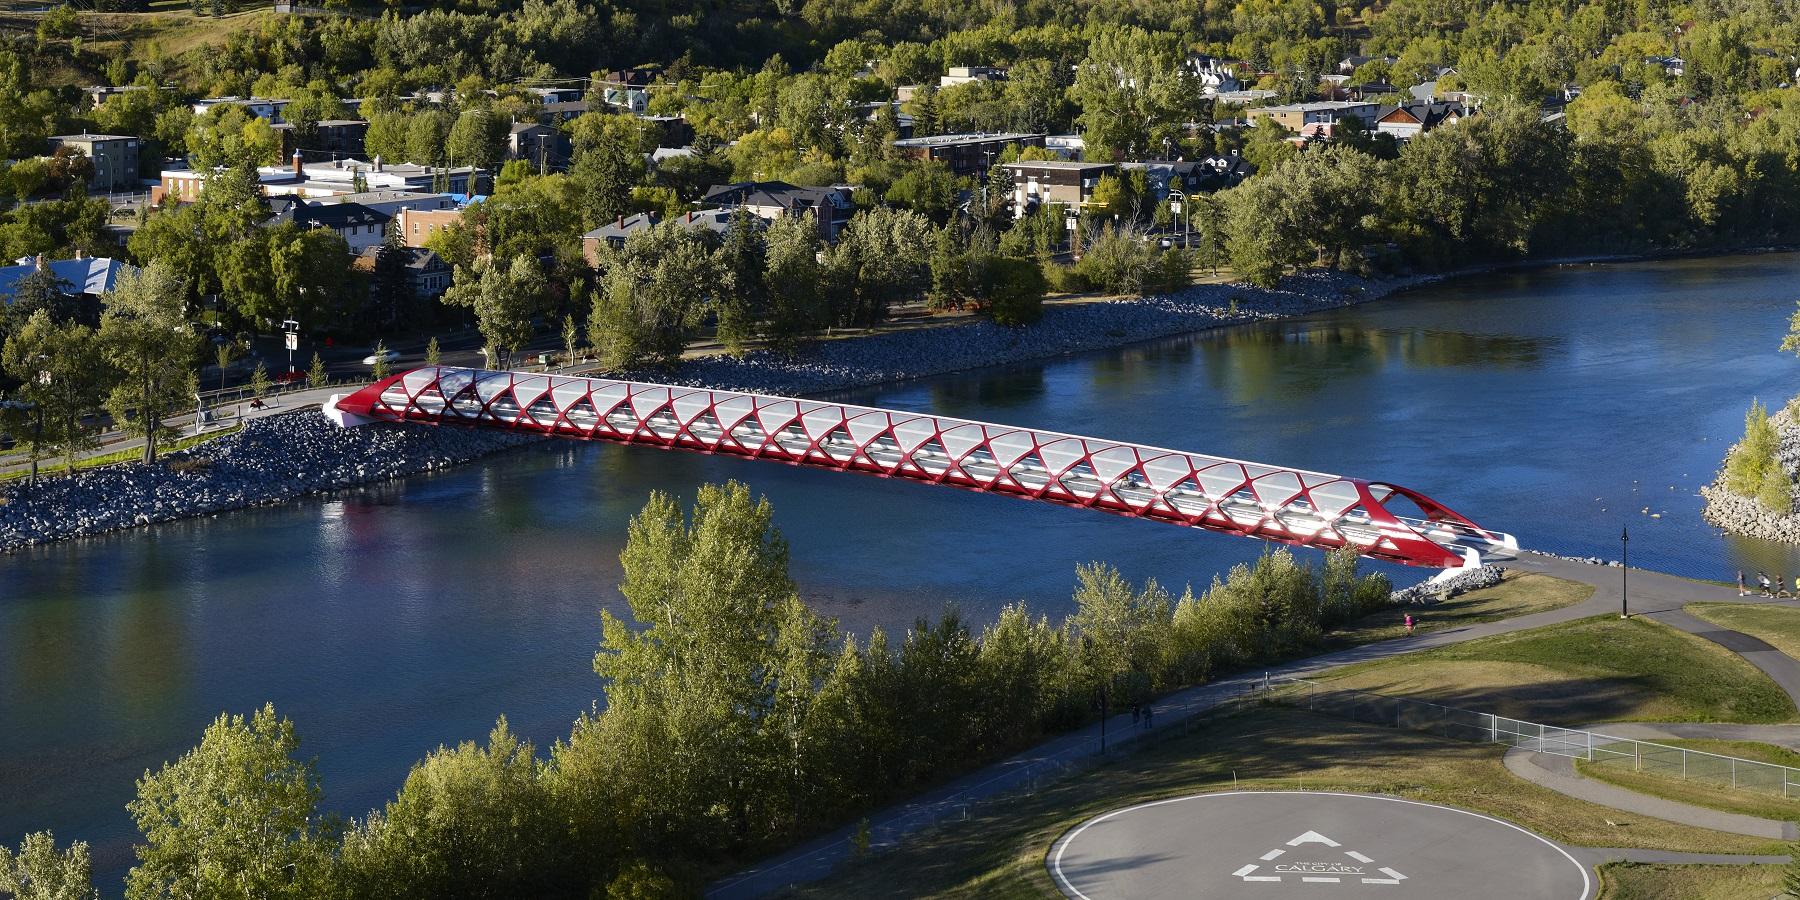 پل عابر پیادهی شهر کلگری در ایالت آلبرتا، کانادا، اثر سانتاگو کالاتراوا